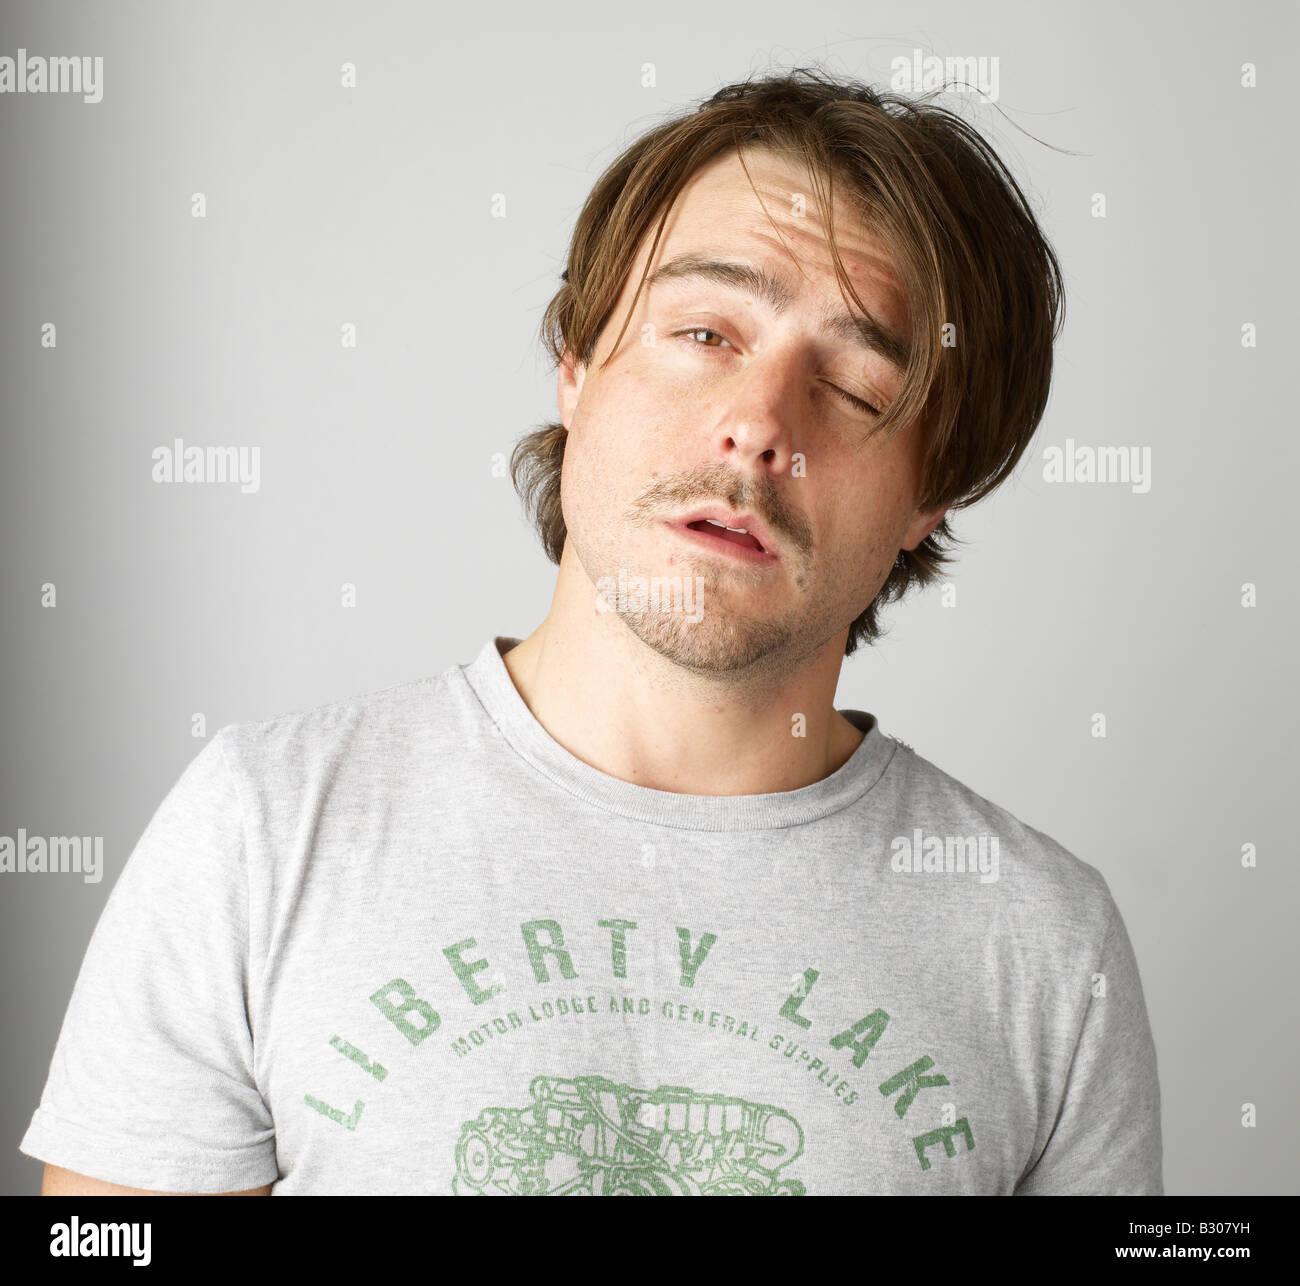 Tired man - Stock Image